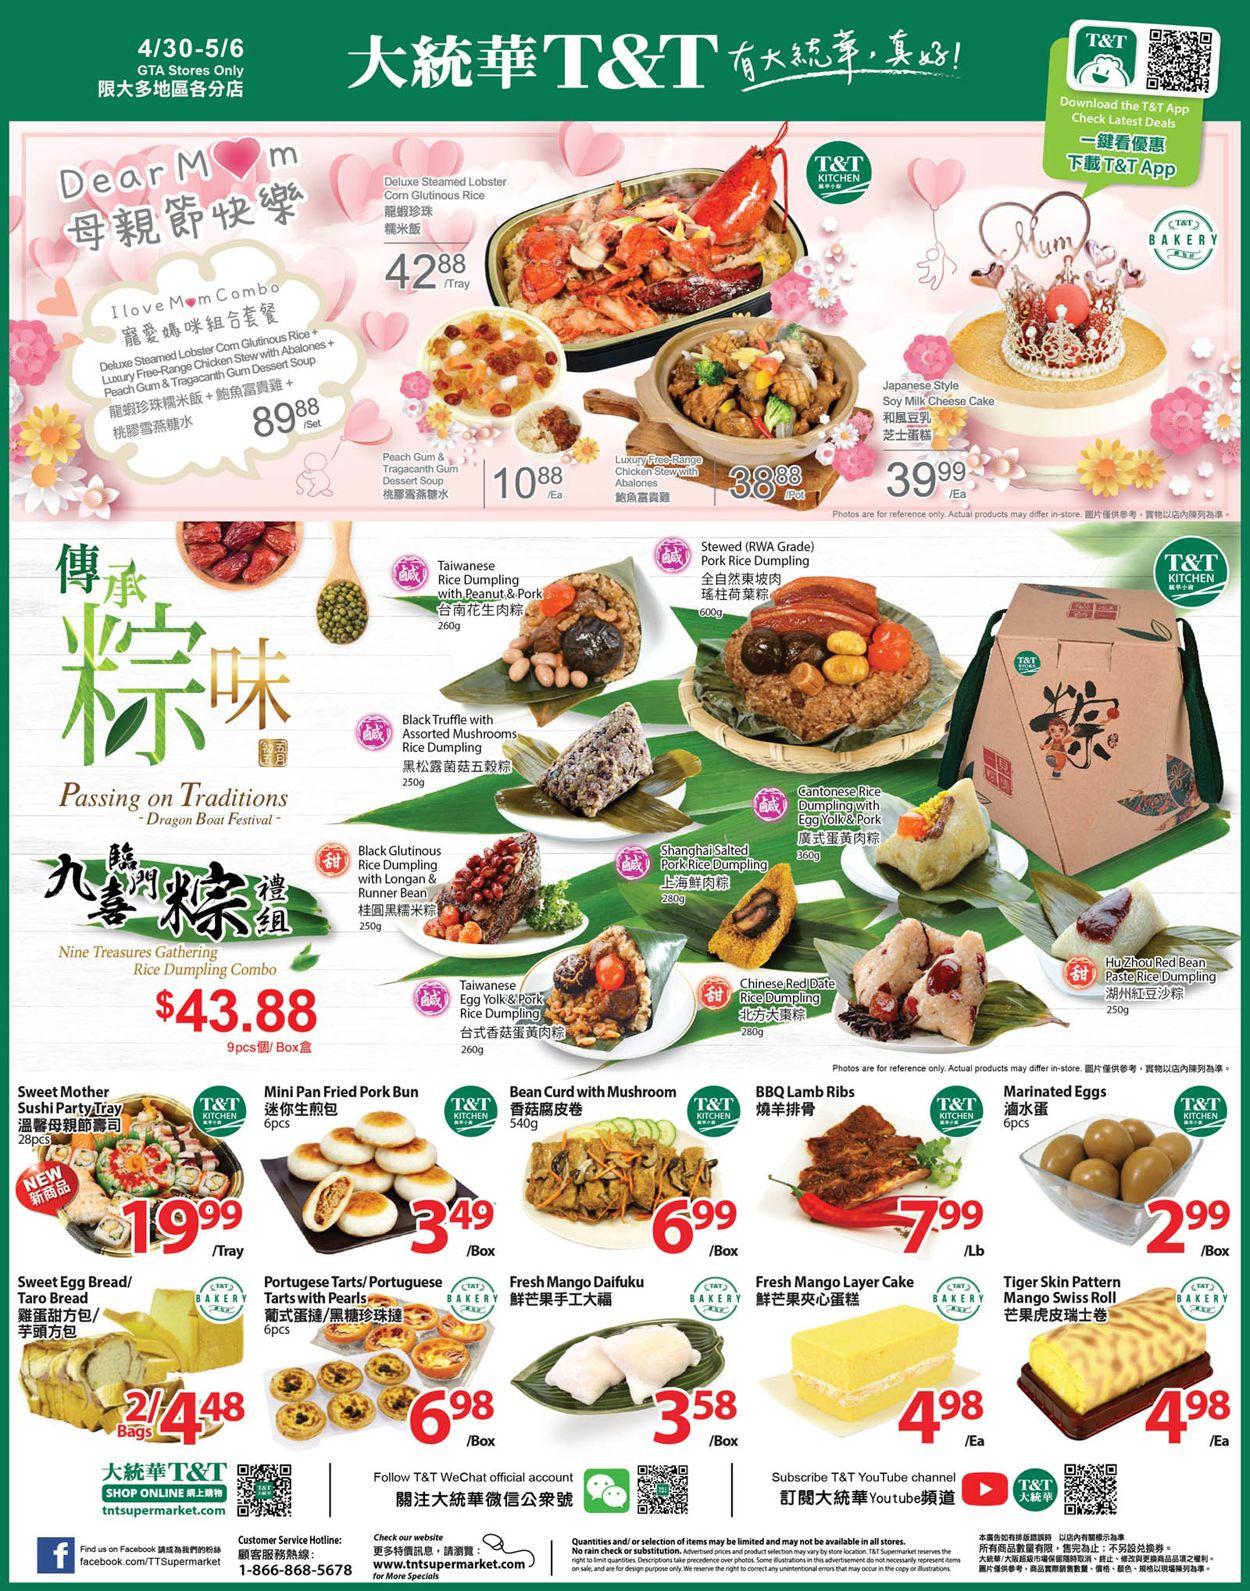 T&T Supermarket - Greater Toronto Area Flyer - 04/30-05/06/2021